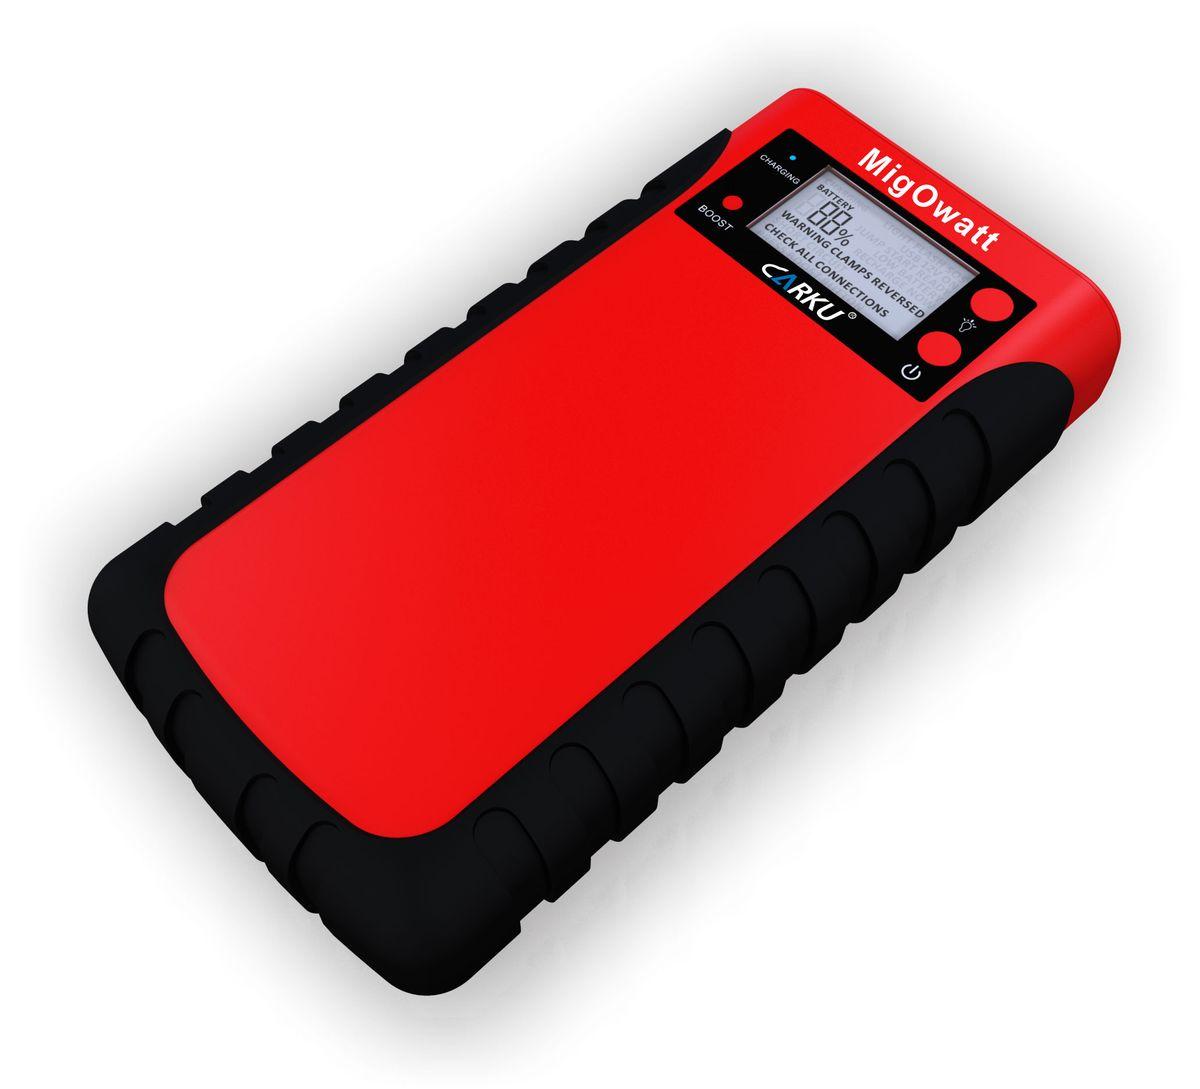 Пуско-зарядное устройство Carku E-Power-43 15000 мАч (55,5 Вт/ч)6956229900369